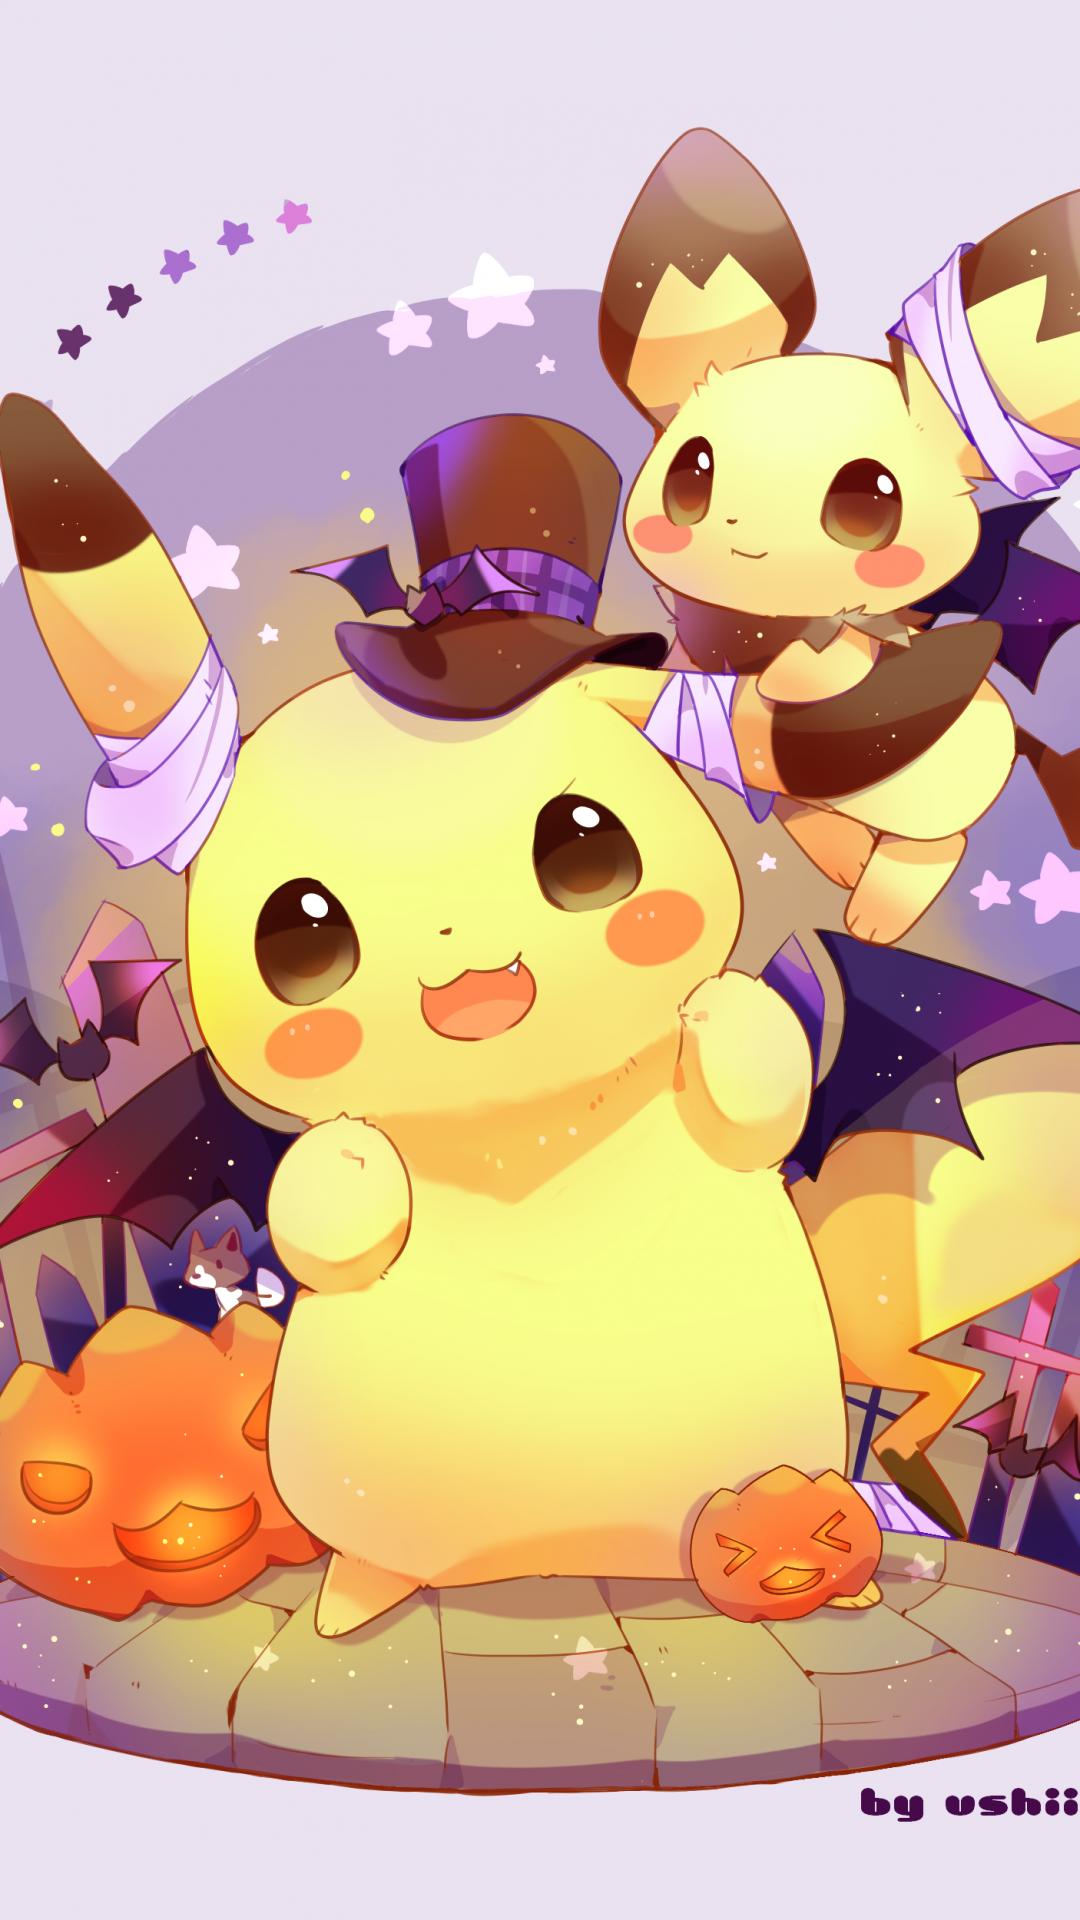 Pikachu Cute Wallpapers - Wallpaper Cave